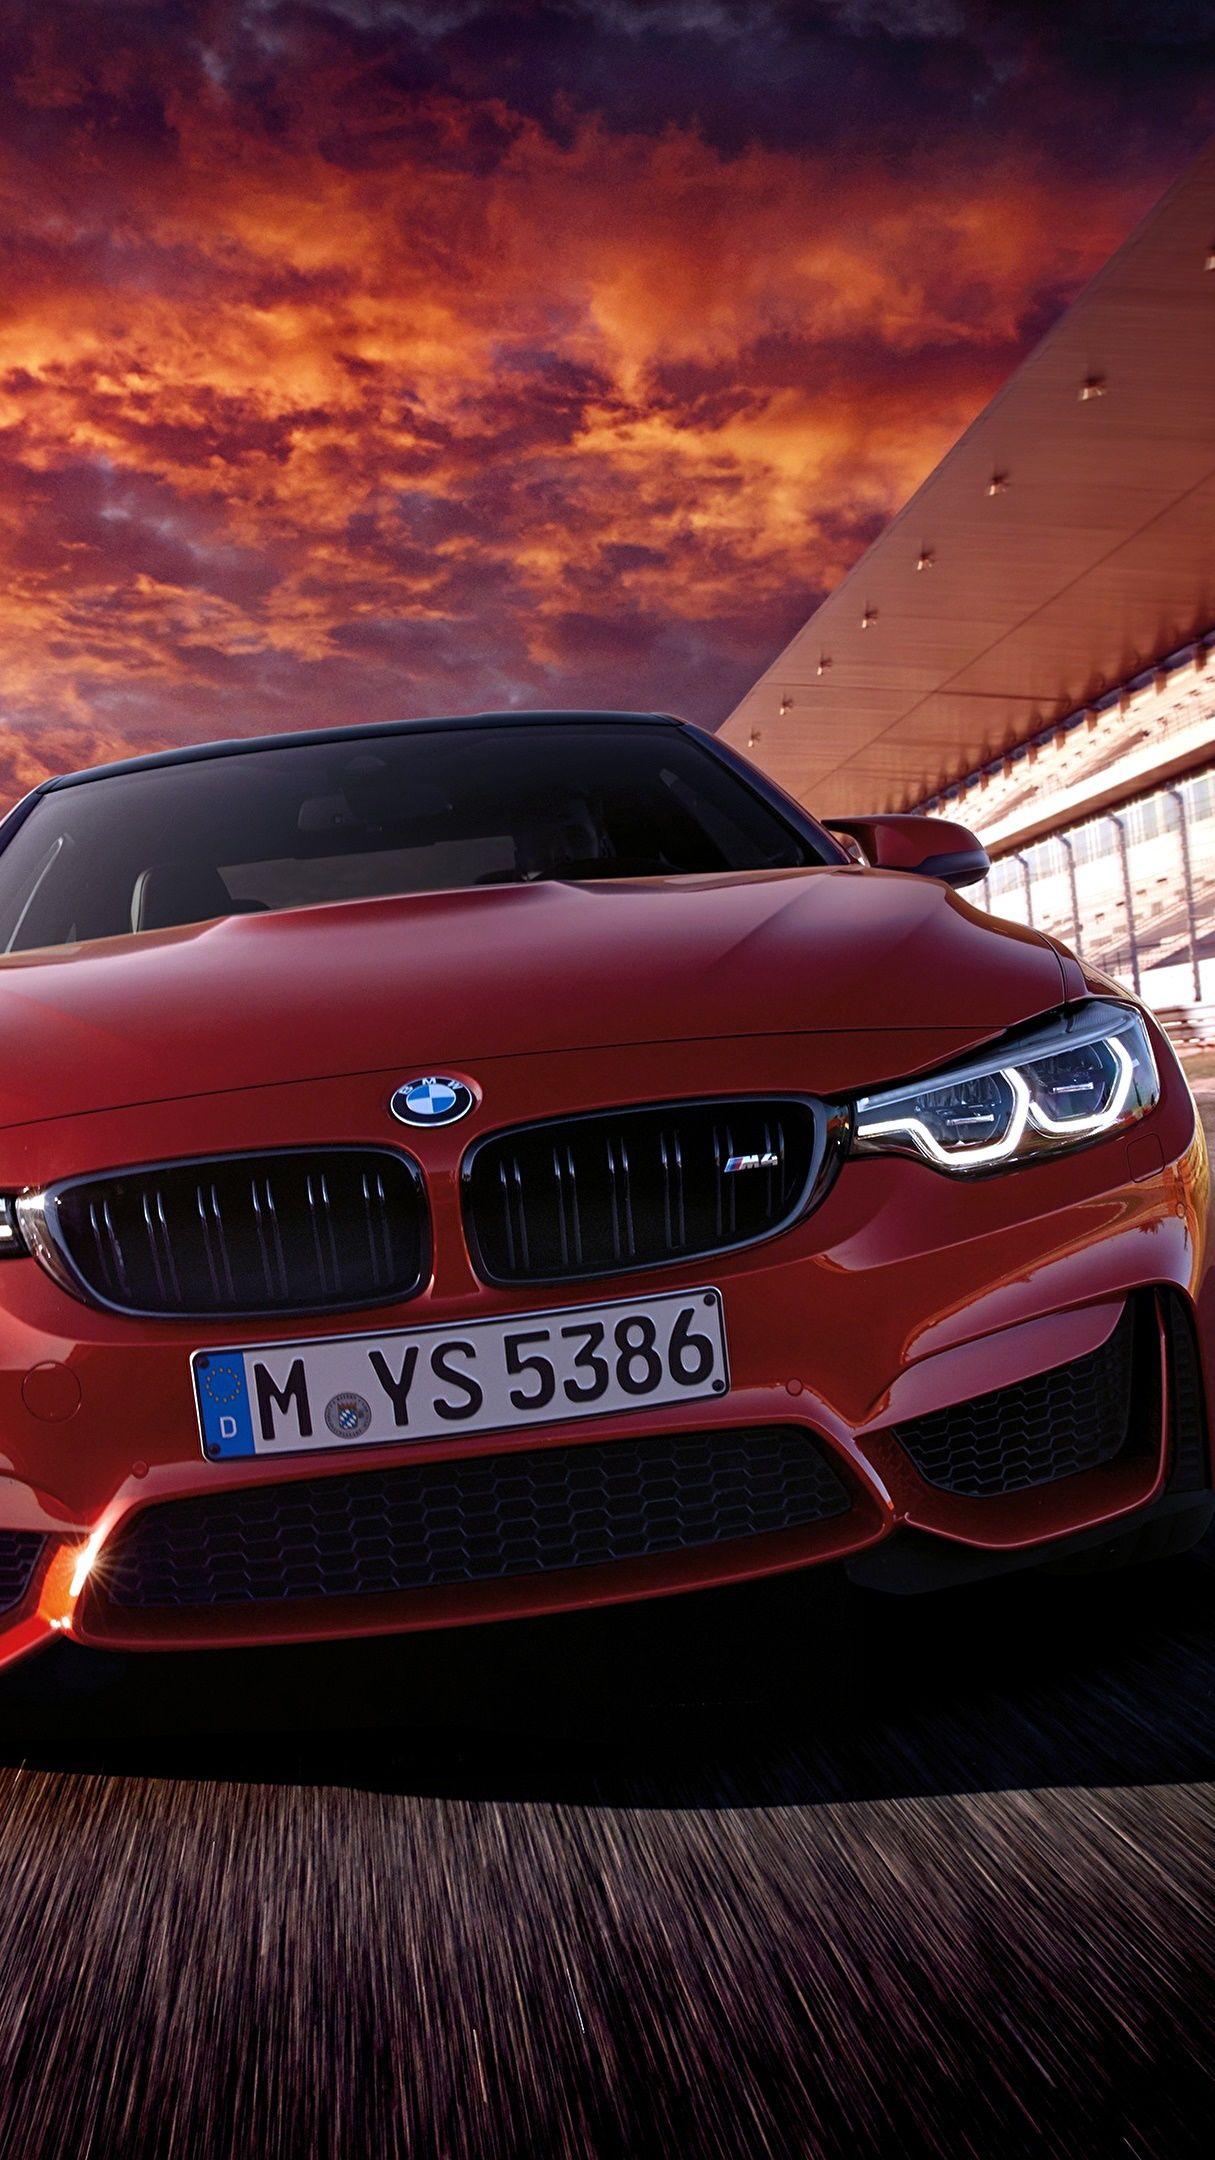 BMW M3 Sports Car 4K UltraHD Wallpaper - backiee